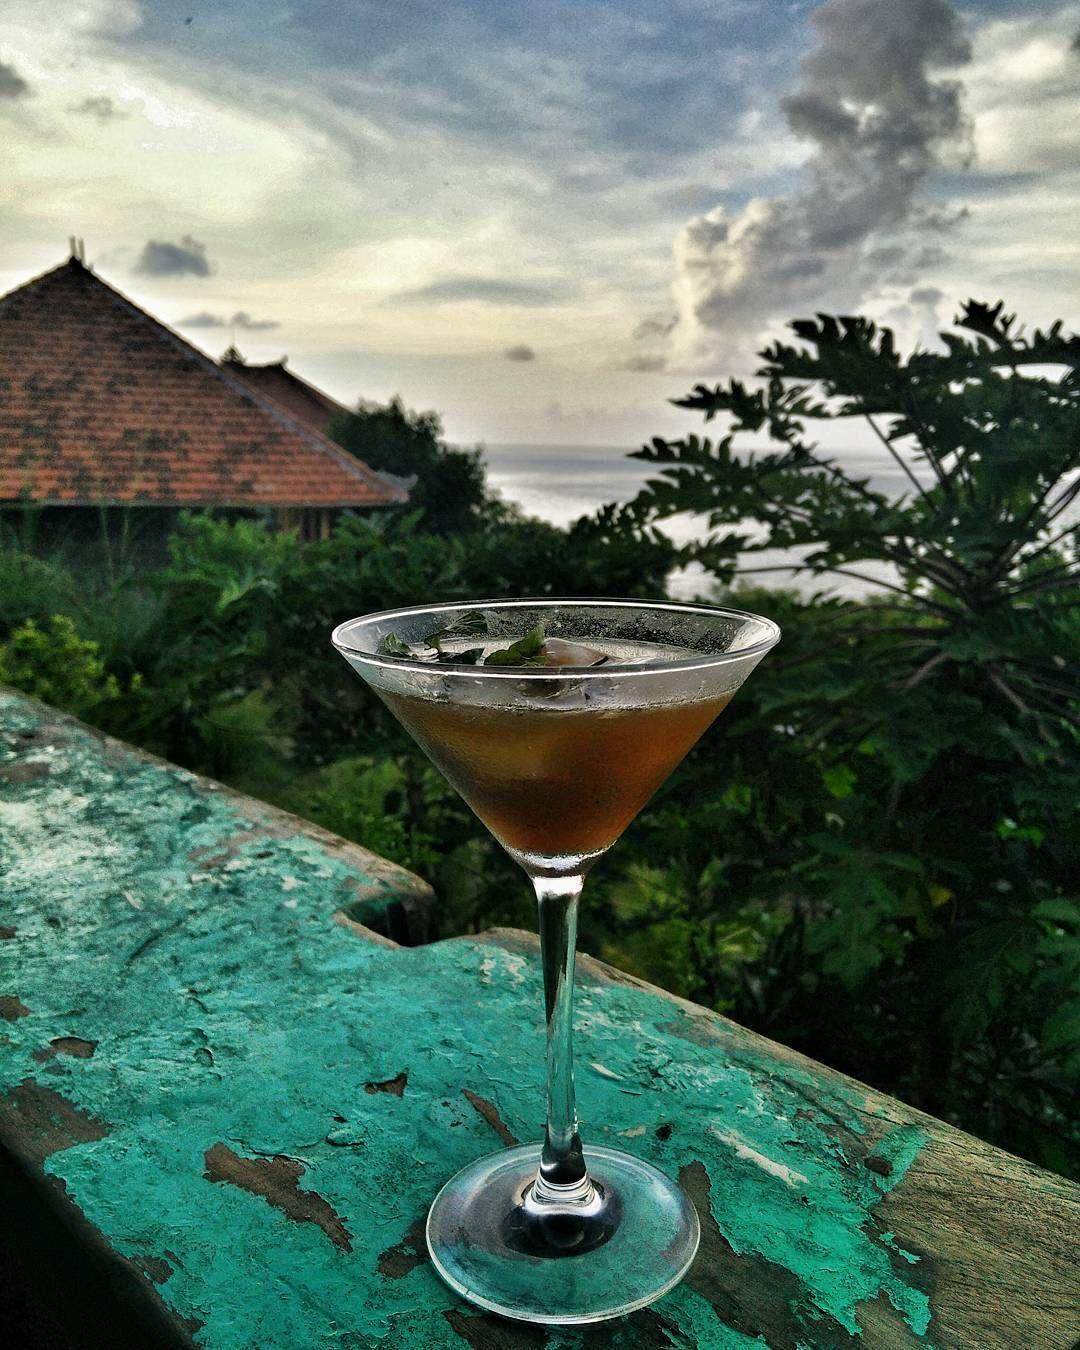 first drink @balilabeachresort ...this place is sooo amazing! #proudofmysis #indonesia #bali #amed #ecoresort #yoga #yogaresort #rawfood #organic #organicliving #beach #eco #gönnereihochzwei by dahiaz